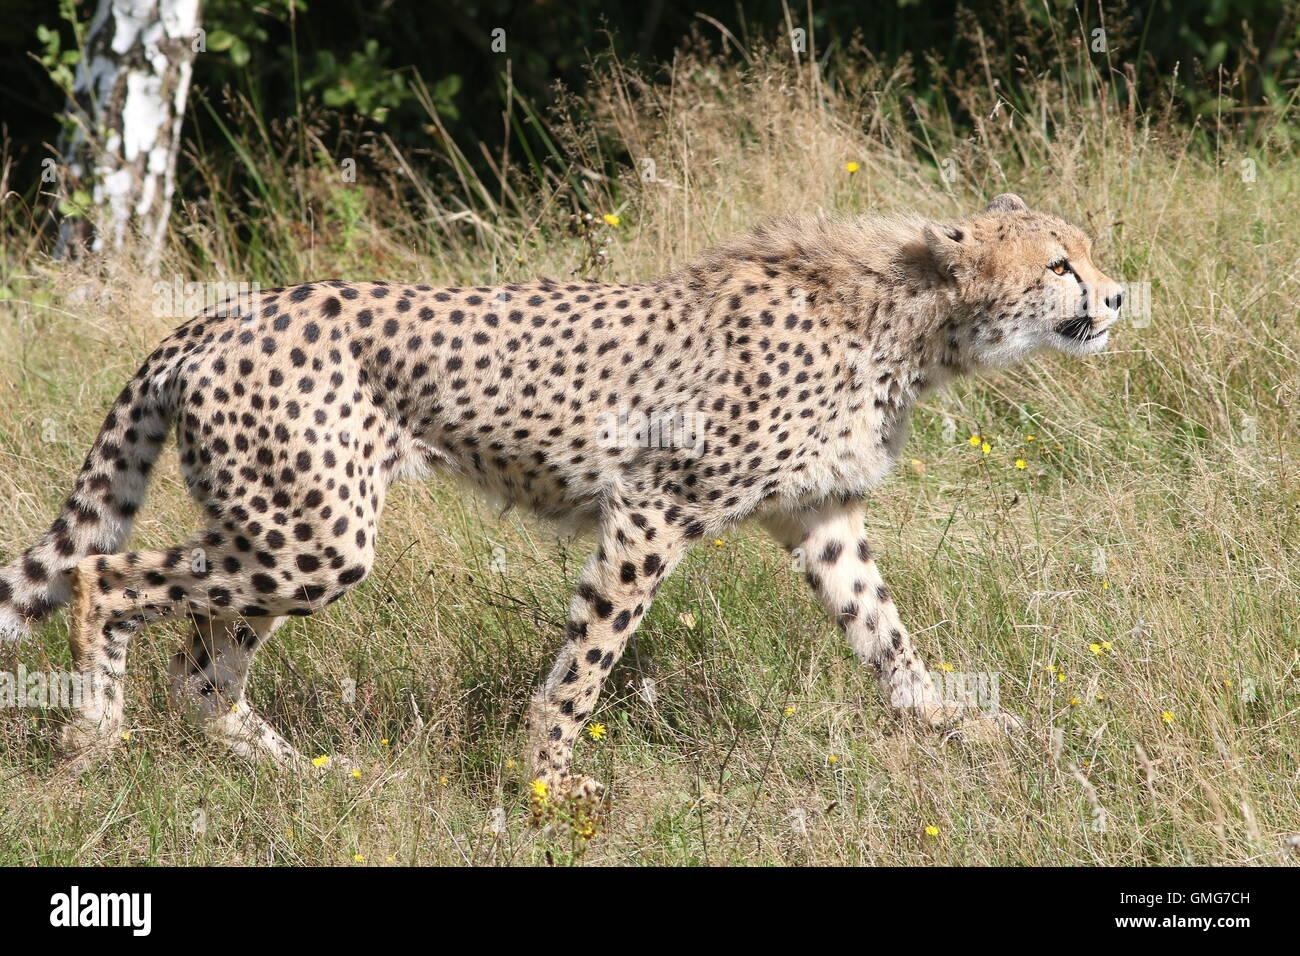 Male African Cheetah (Acinonyx jubatus)  walking, seen in profile - Stock Image